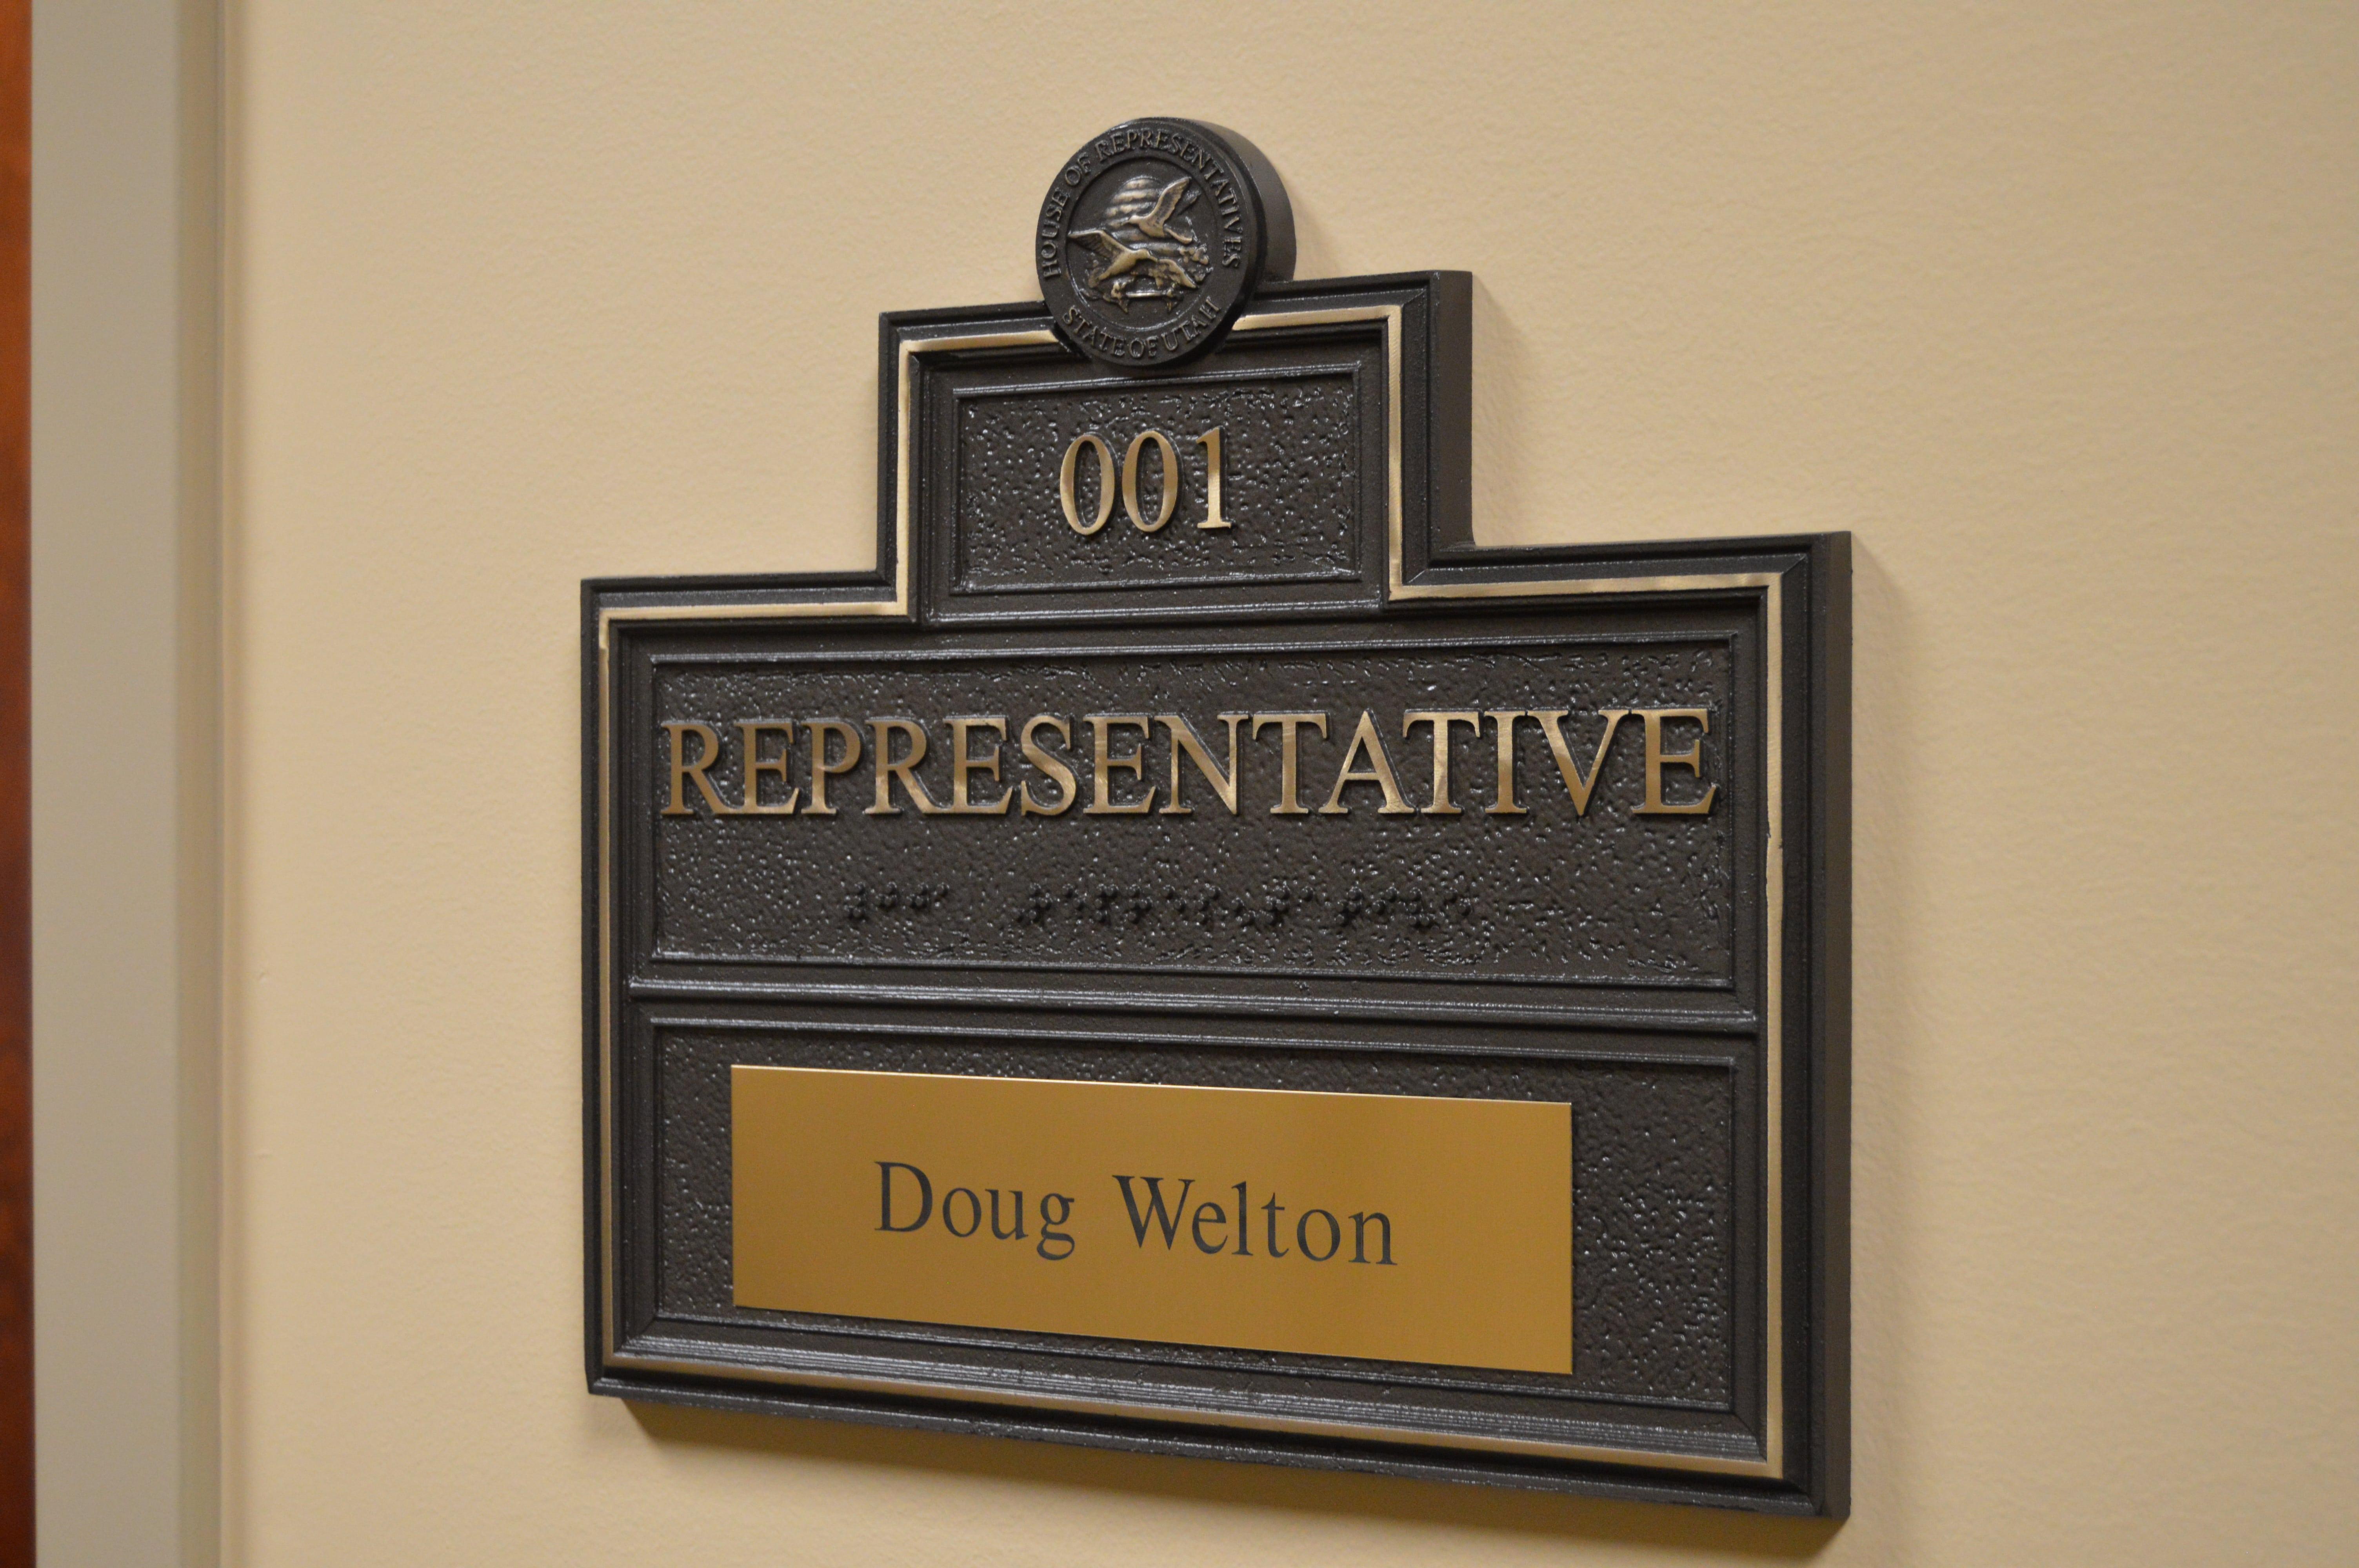 Rep Welton Office